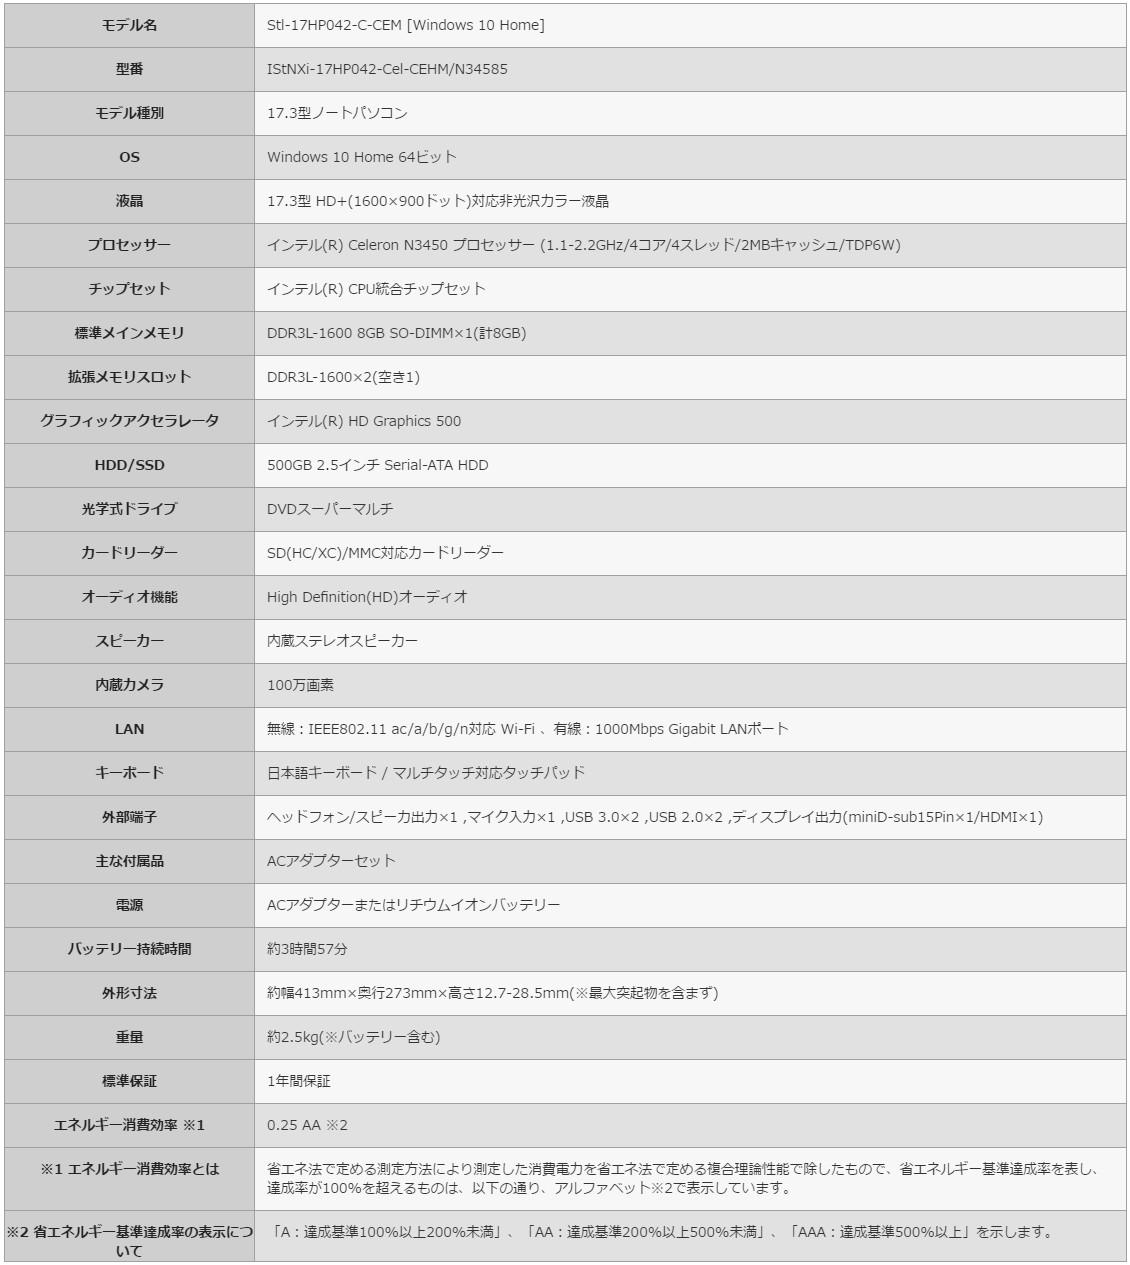 iiyama STYLE-17HP042-C-CE スペック表